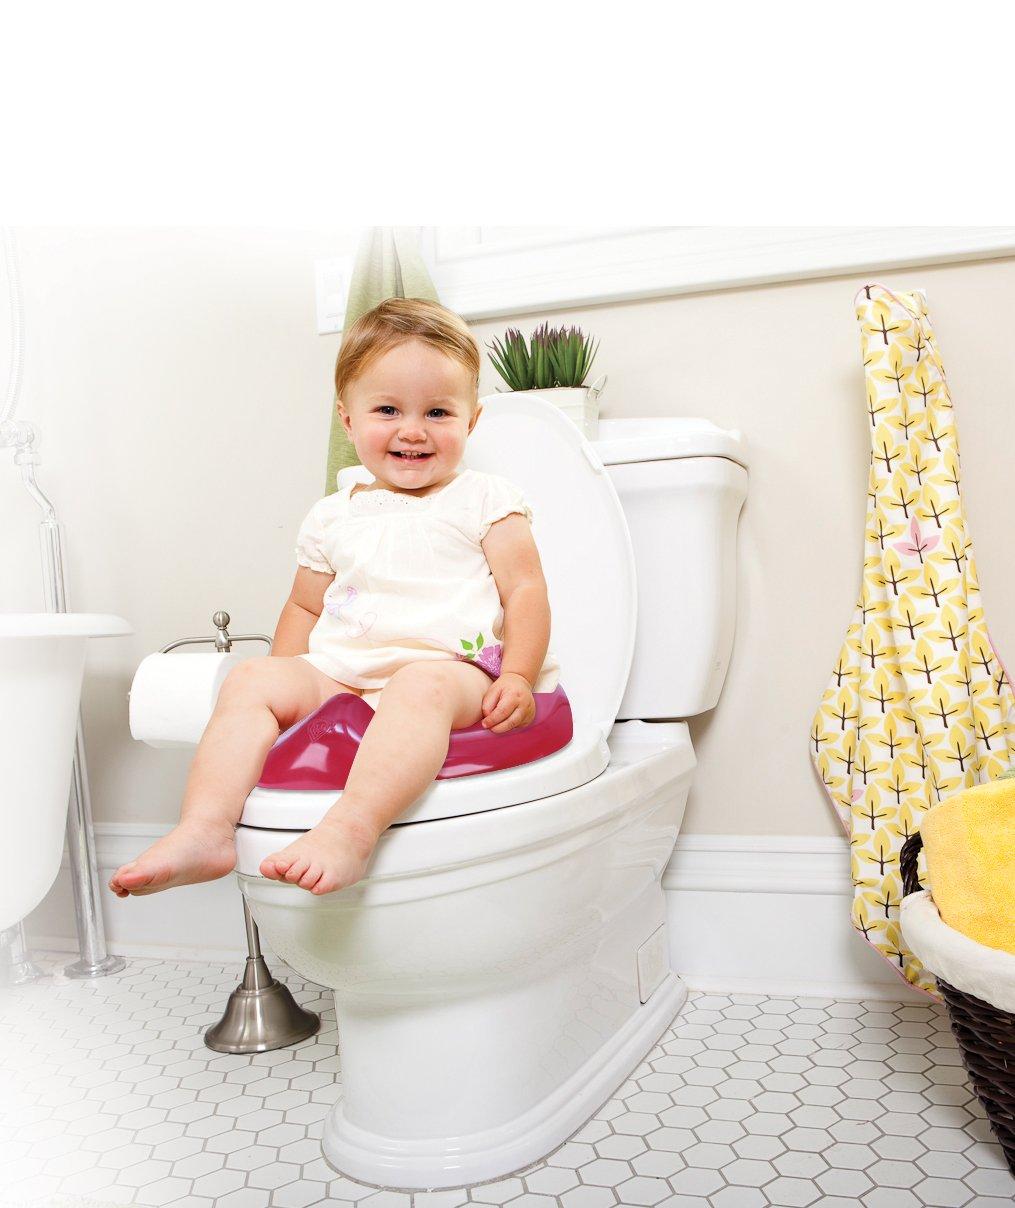 Prince Lionheart weePOD Basix Baby-Sitzauflage f/ür WC